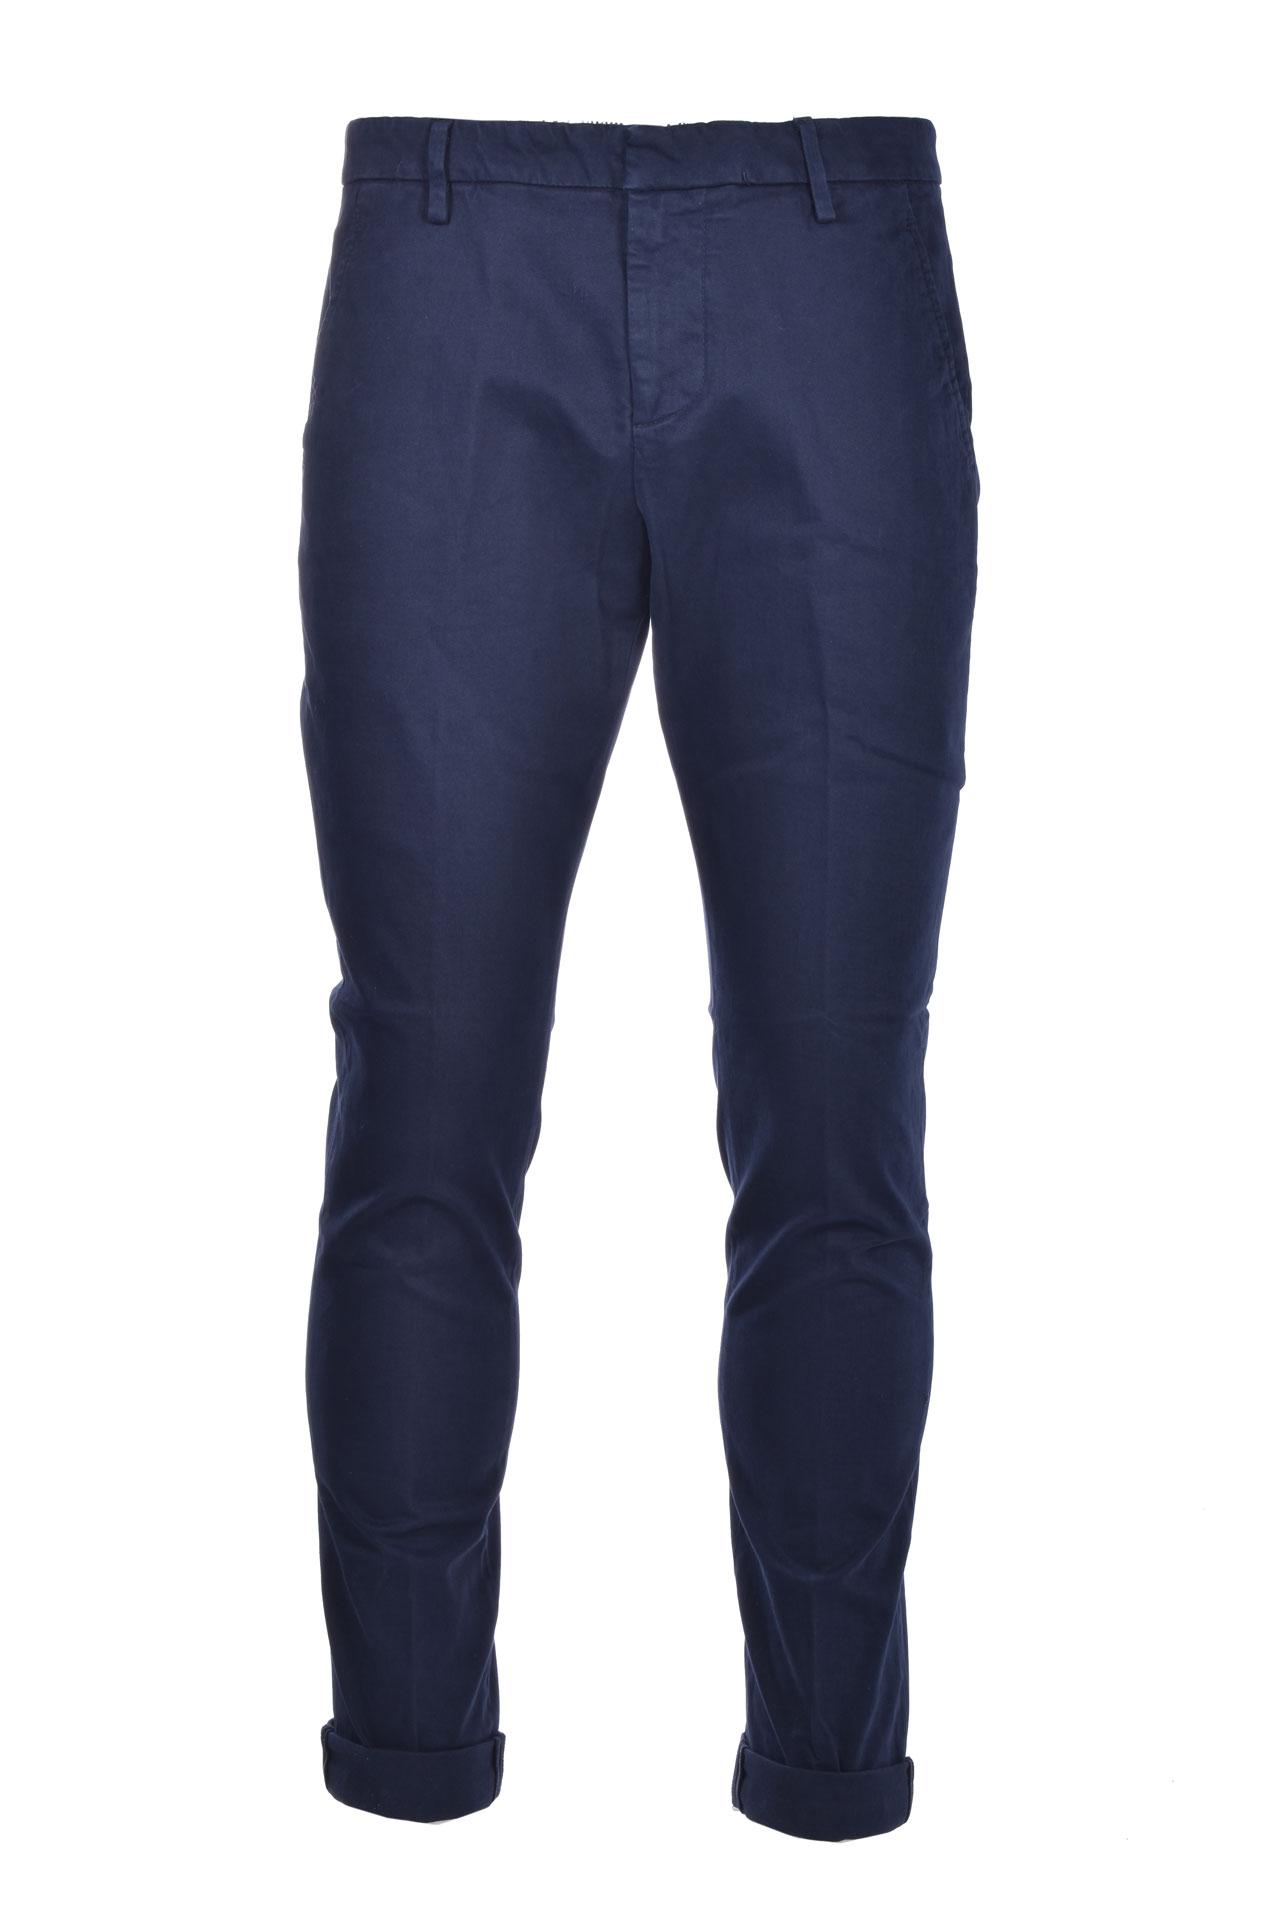 Pantalone chino slim in gabardin DONDUP | Pantaloni | UP235GSE043PTDDU890U